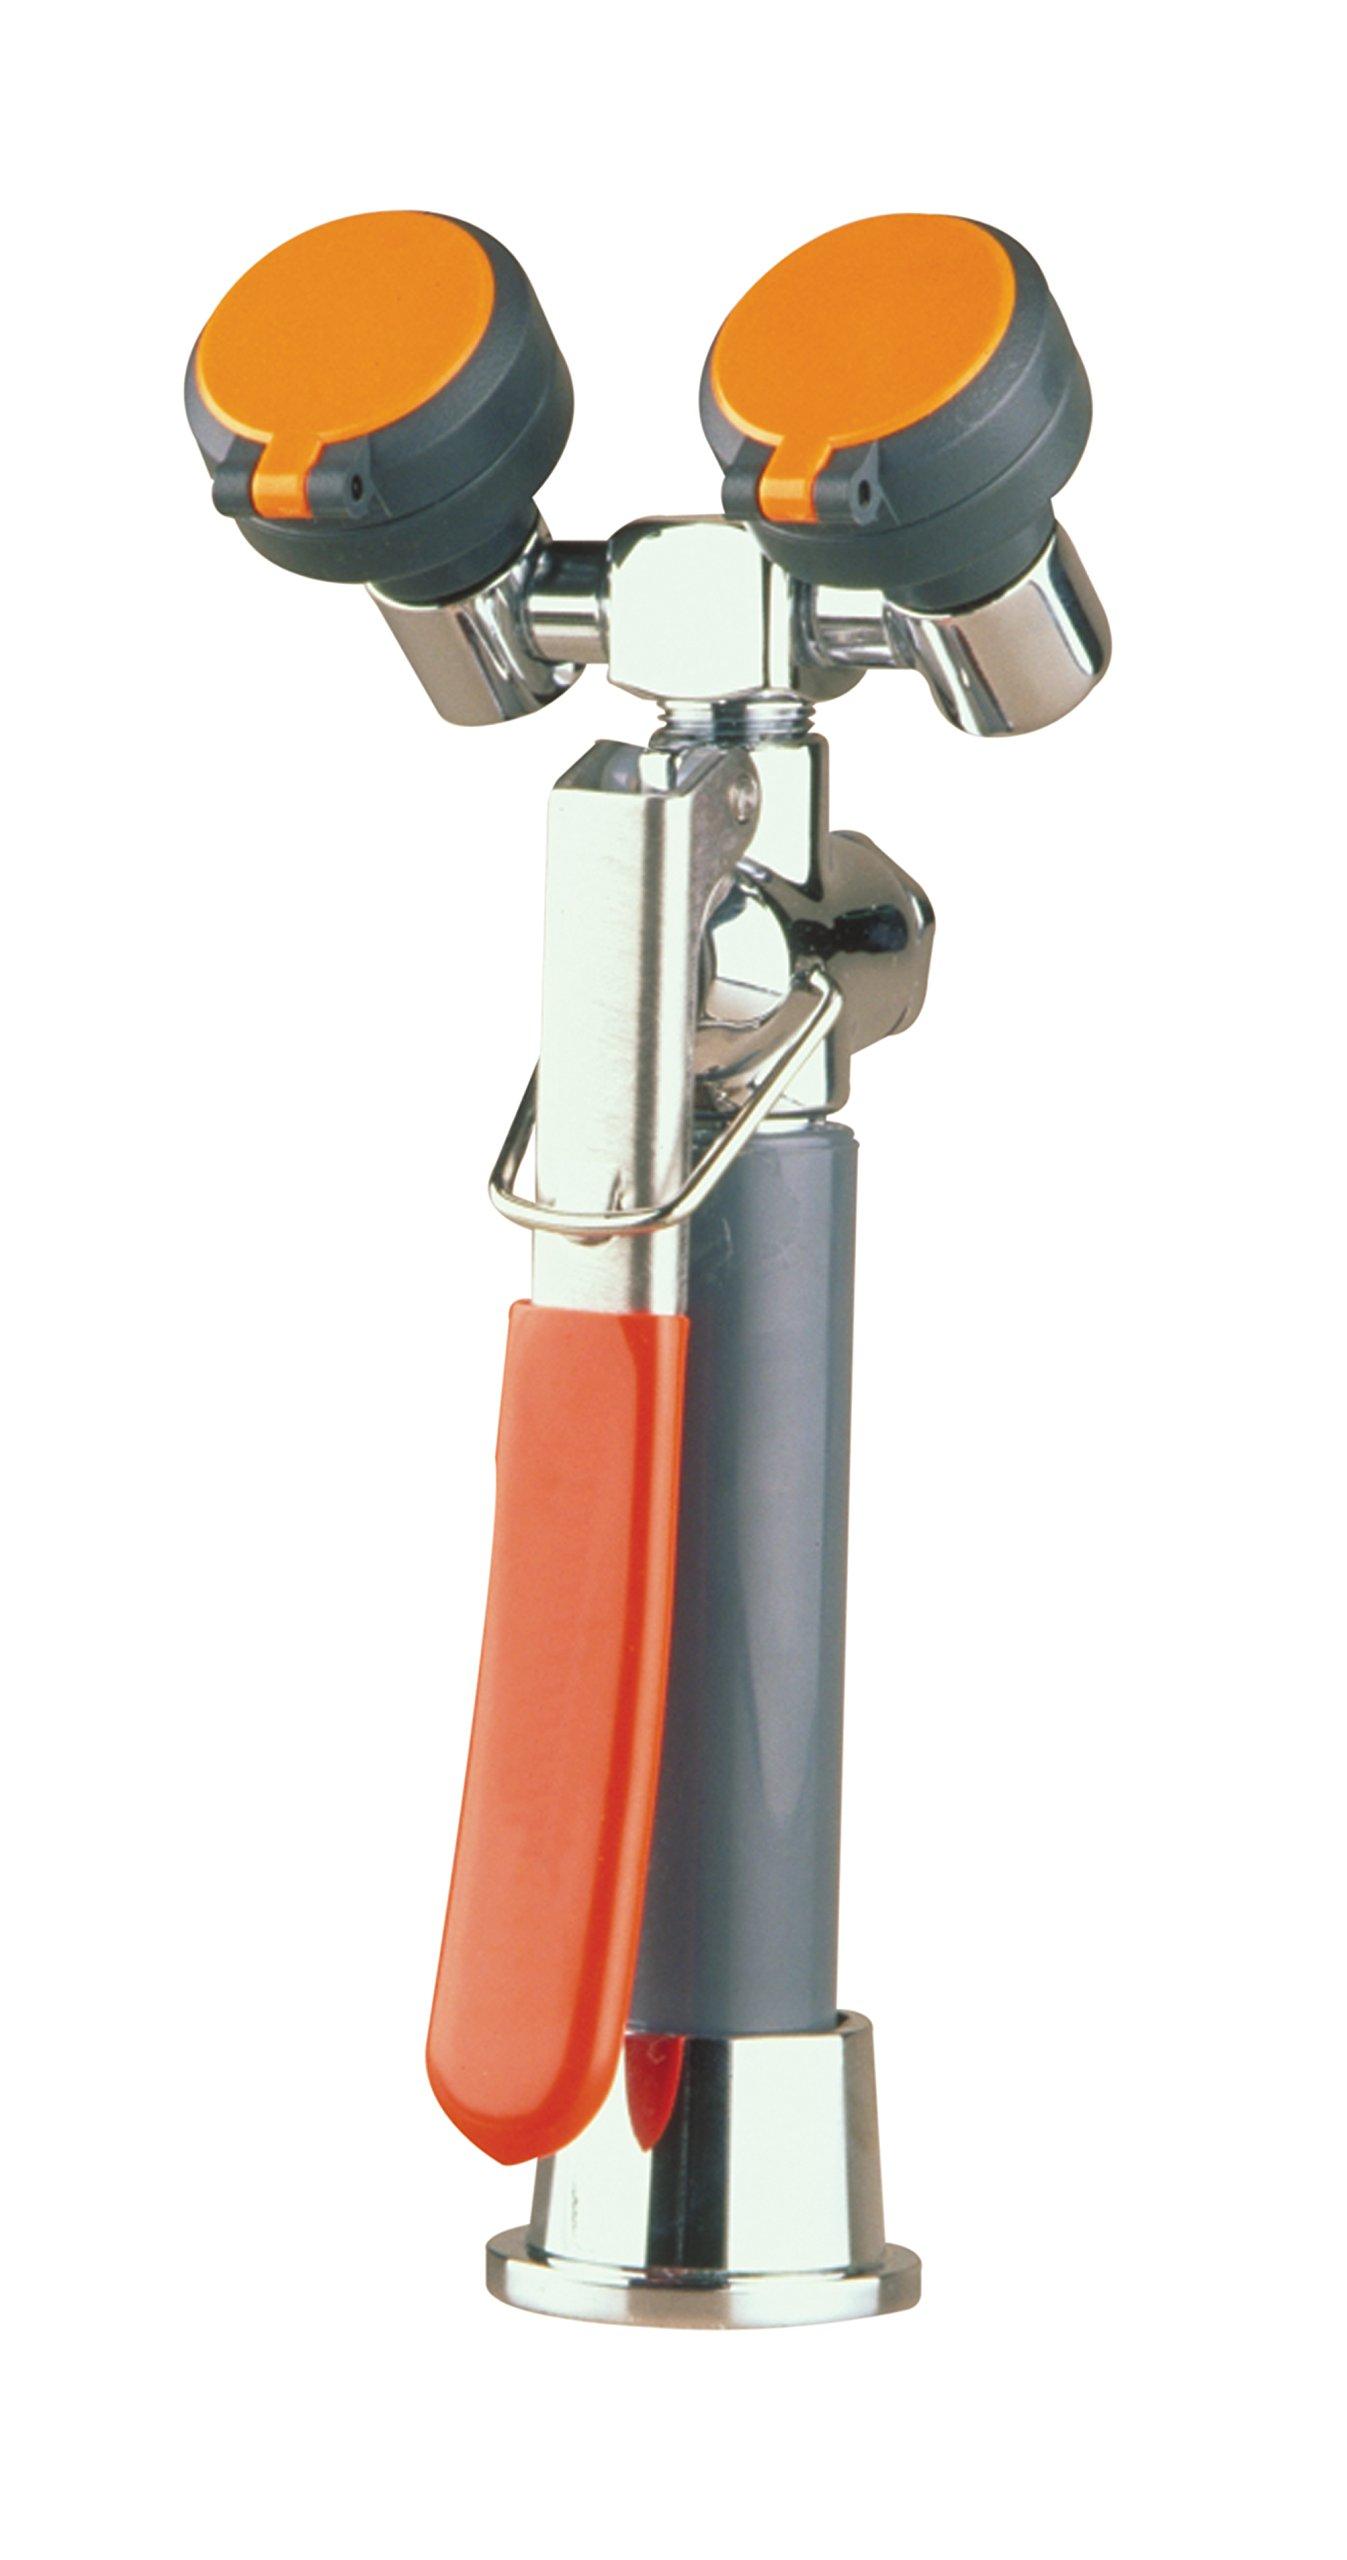 WaterSaver EW1022 Hands Free Eyewash/Drench Hose Unit with Flip-Top Spray Head, Deck Mount